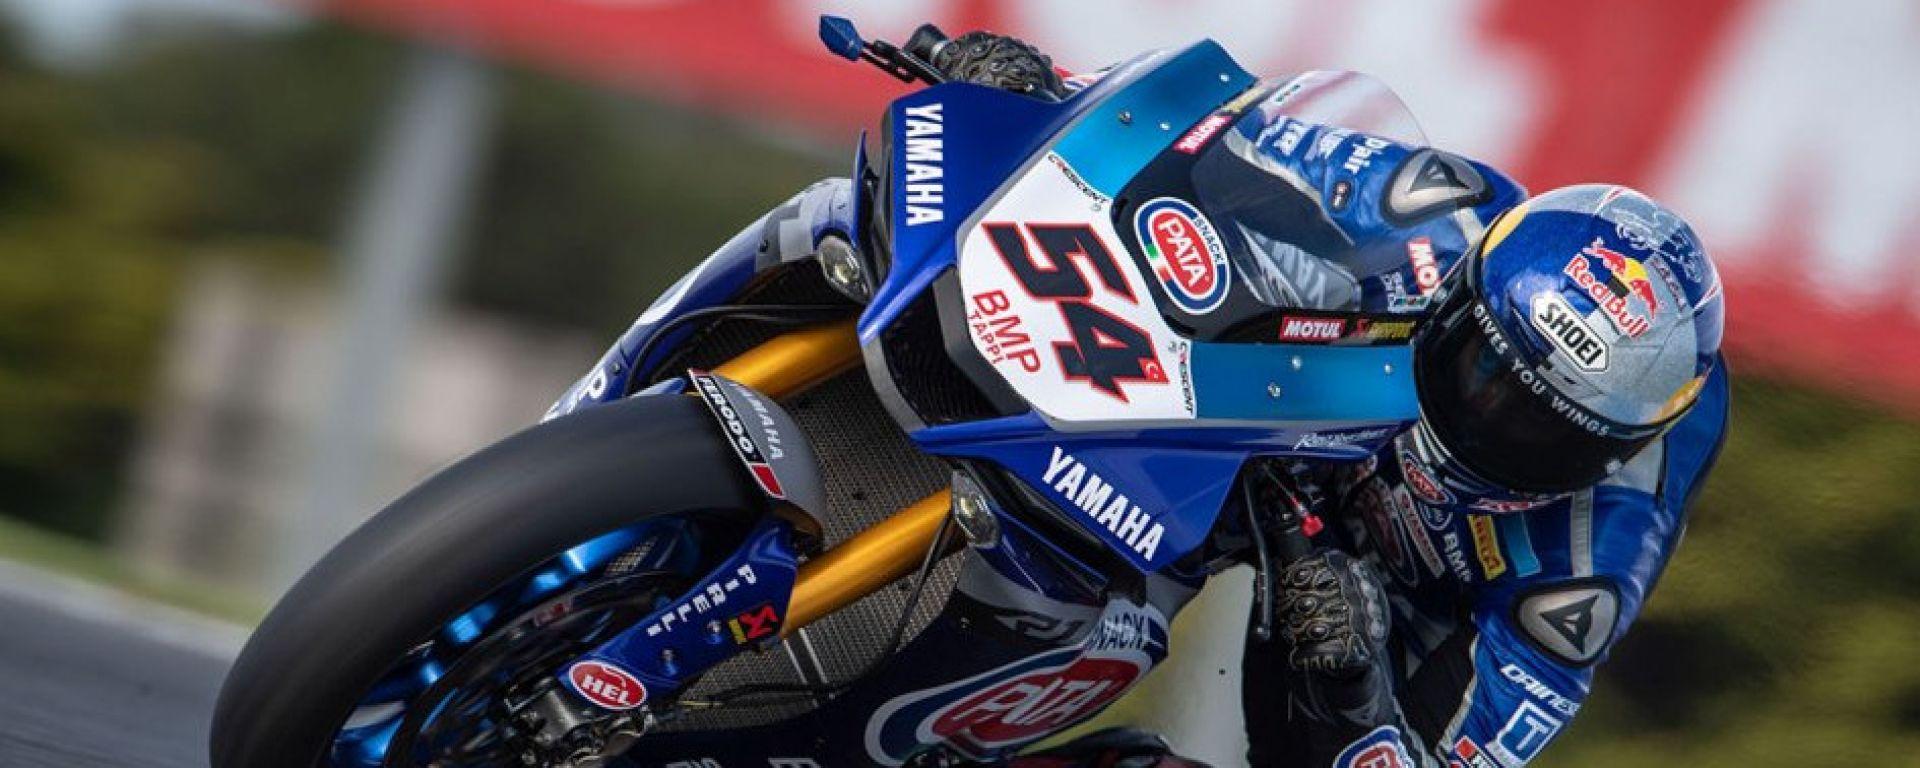 Toprak Razgatlioglu (Yamaha team Pata) Superbike